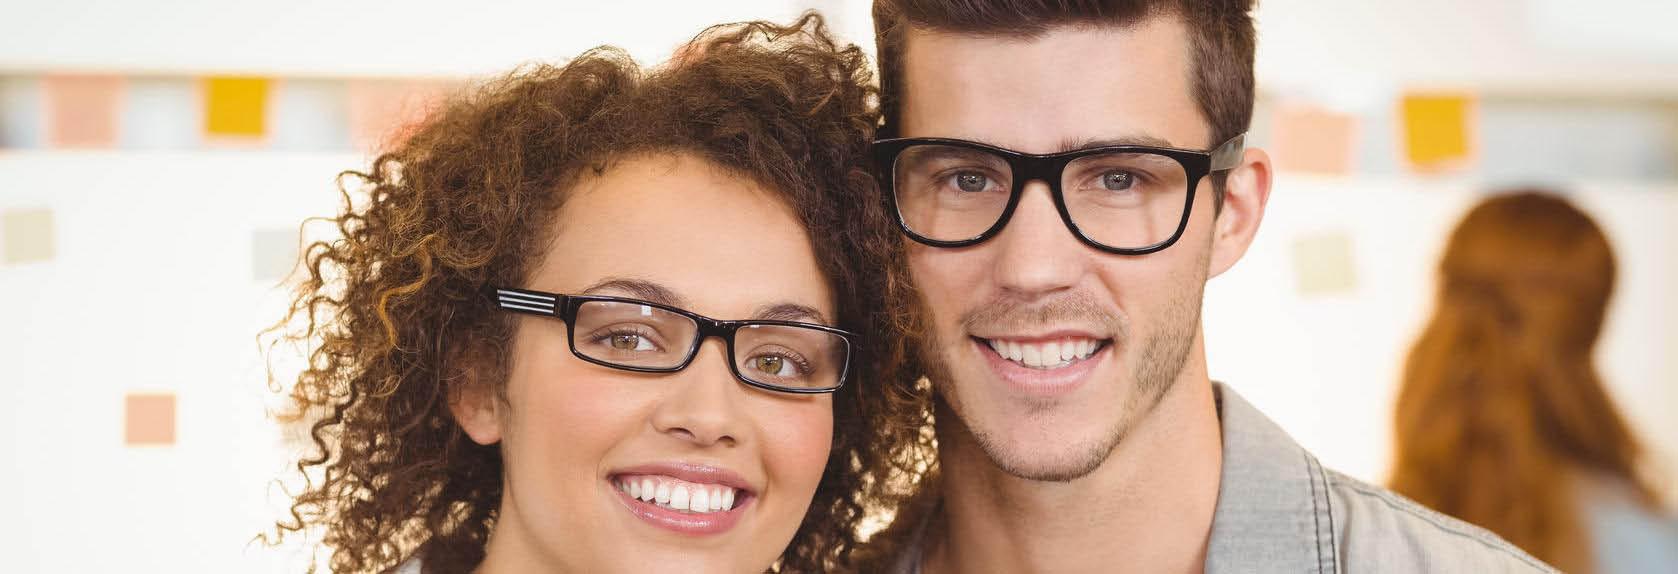 Paoli Opticians, paoli, optician, glasses, frames, glasses discount, coupon, valpak, vision